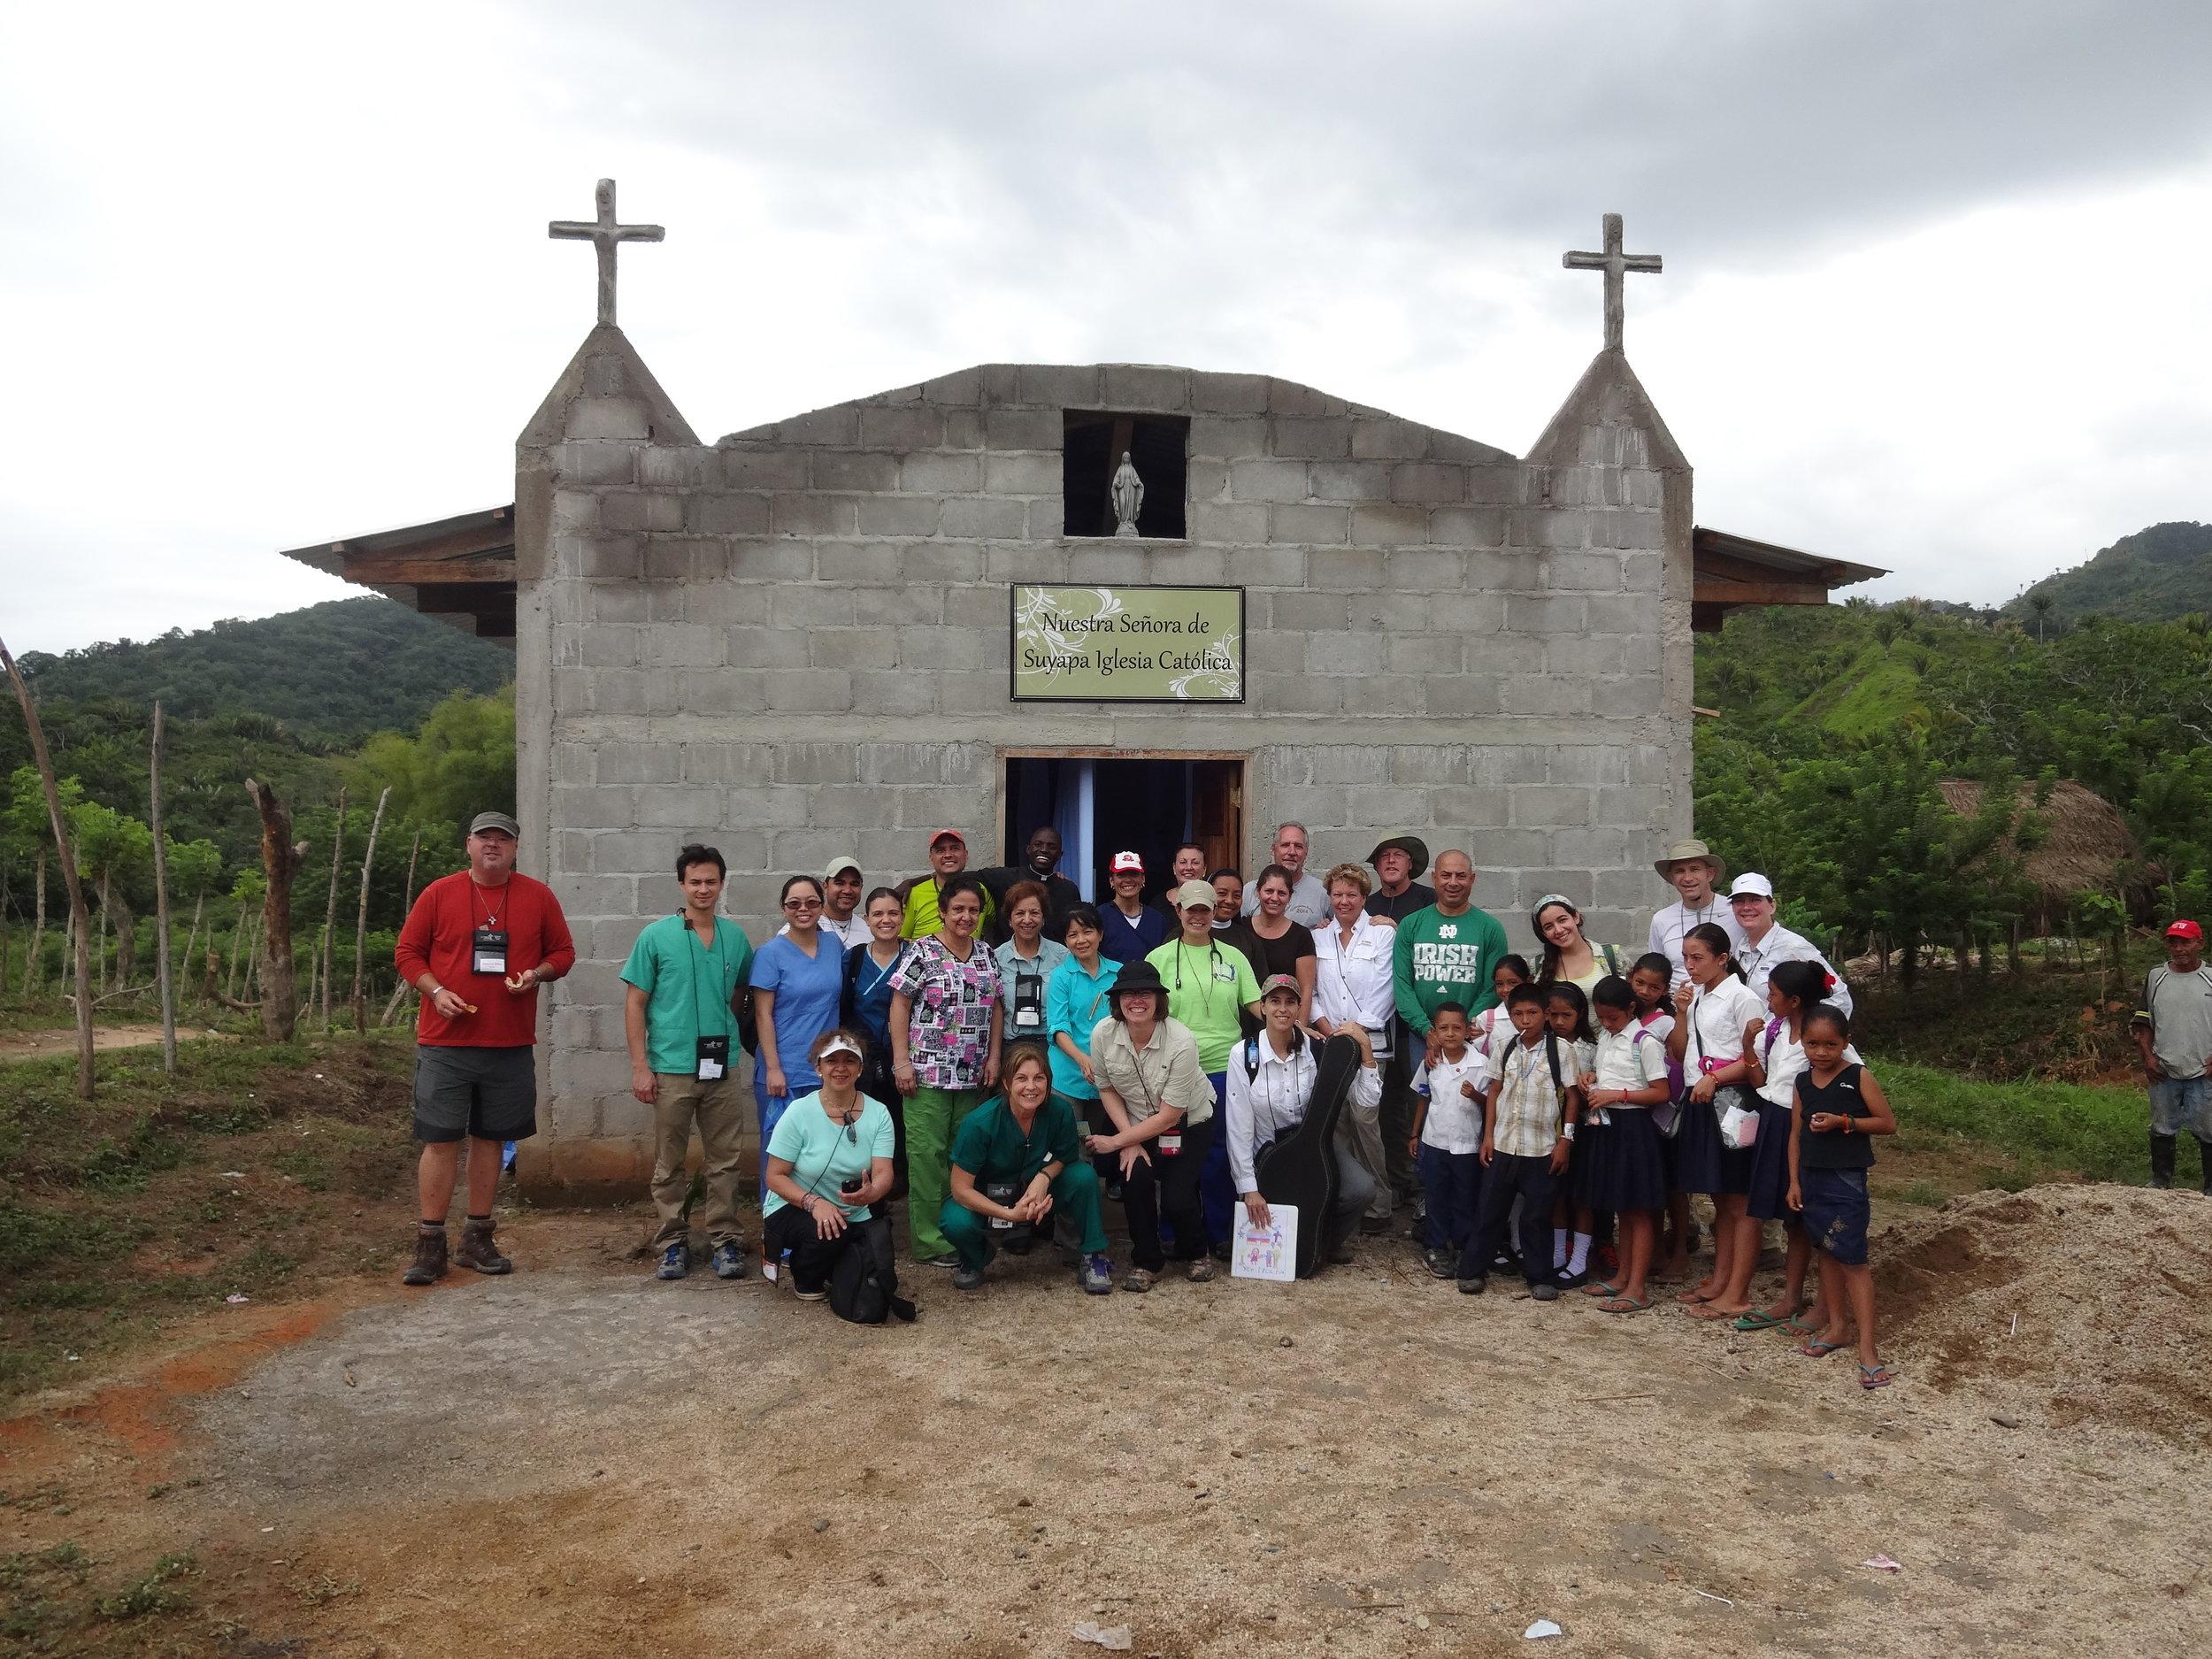 La Colonia chapel 2014